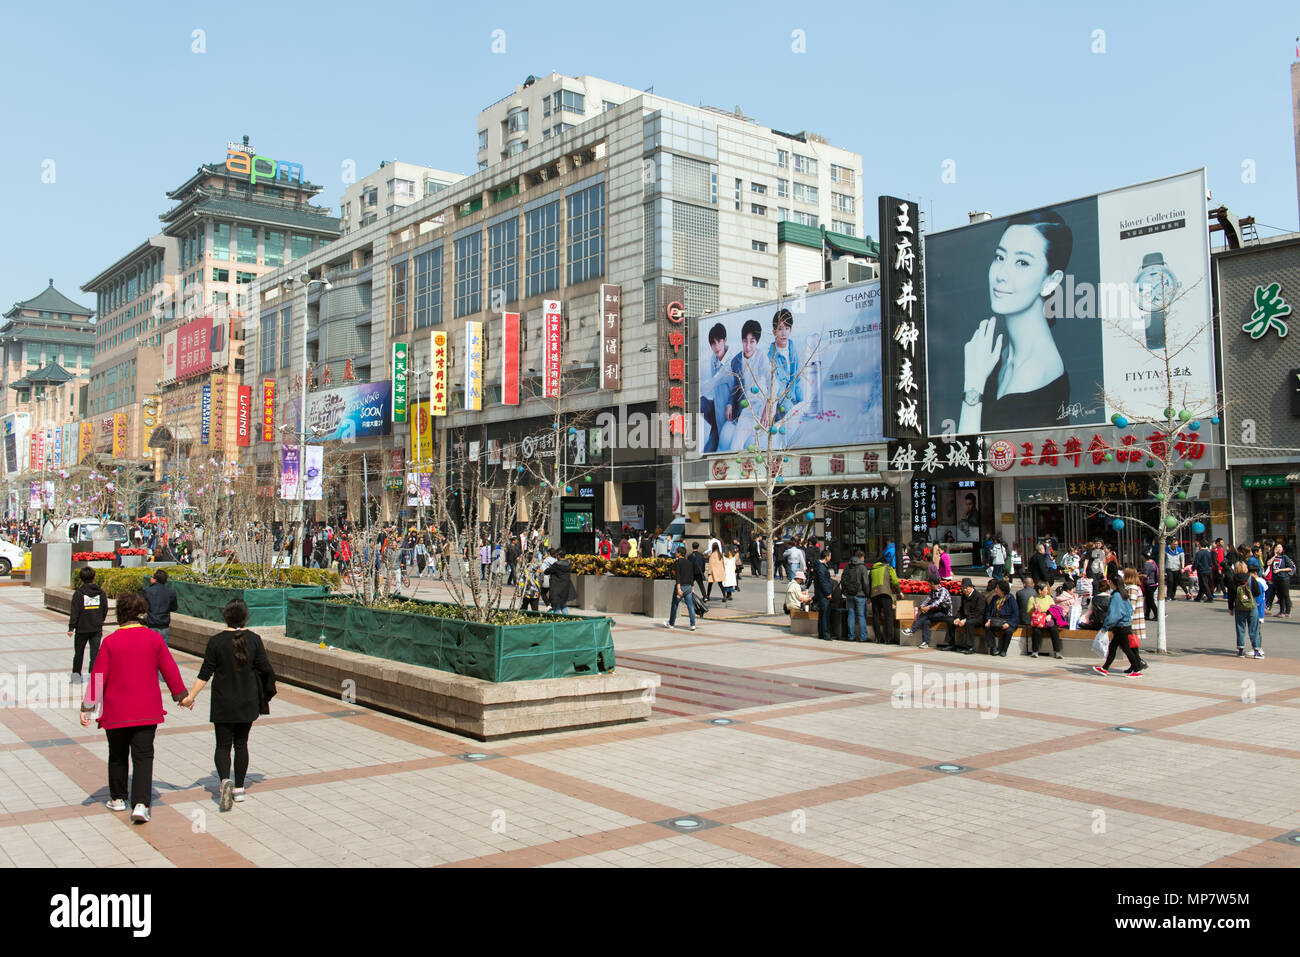 Wangfujing street at Beijing China - Stock Image